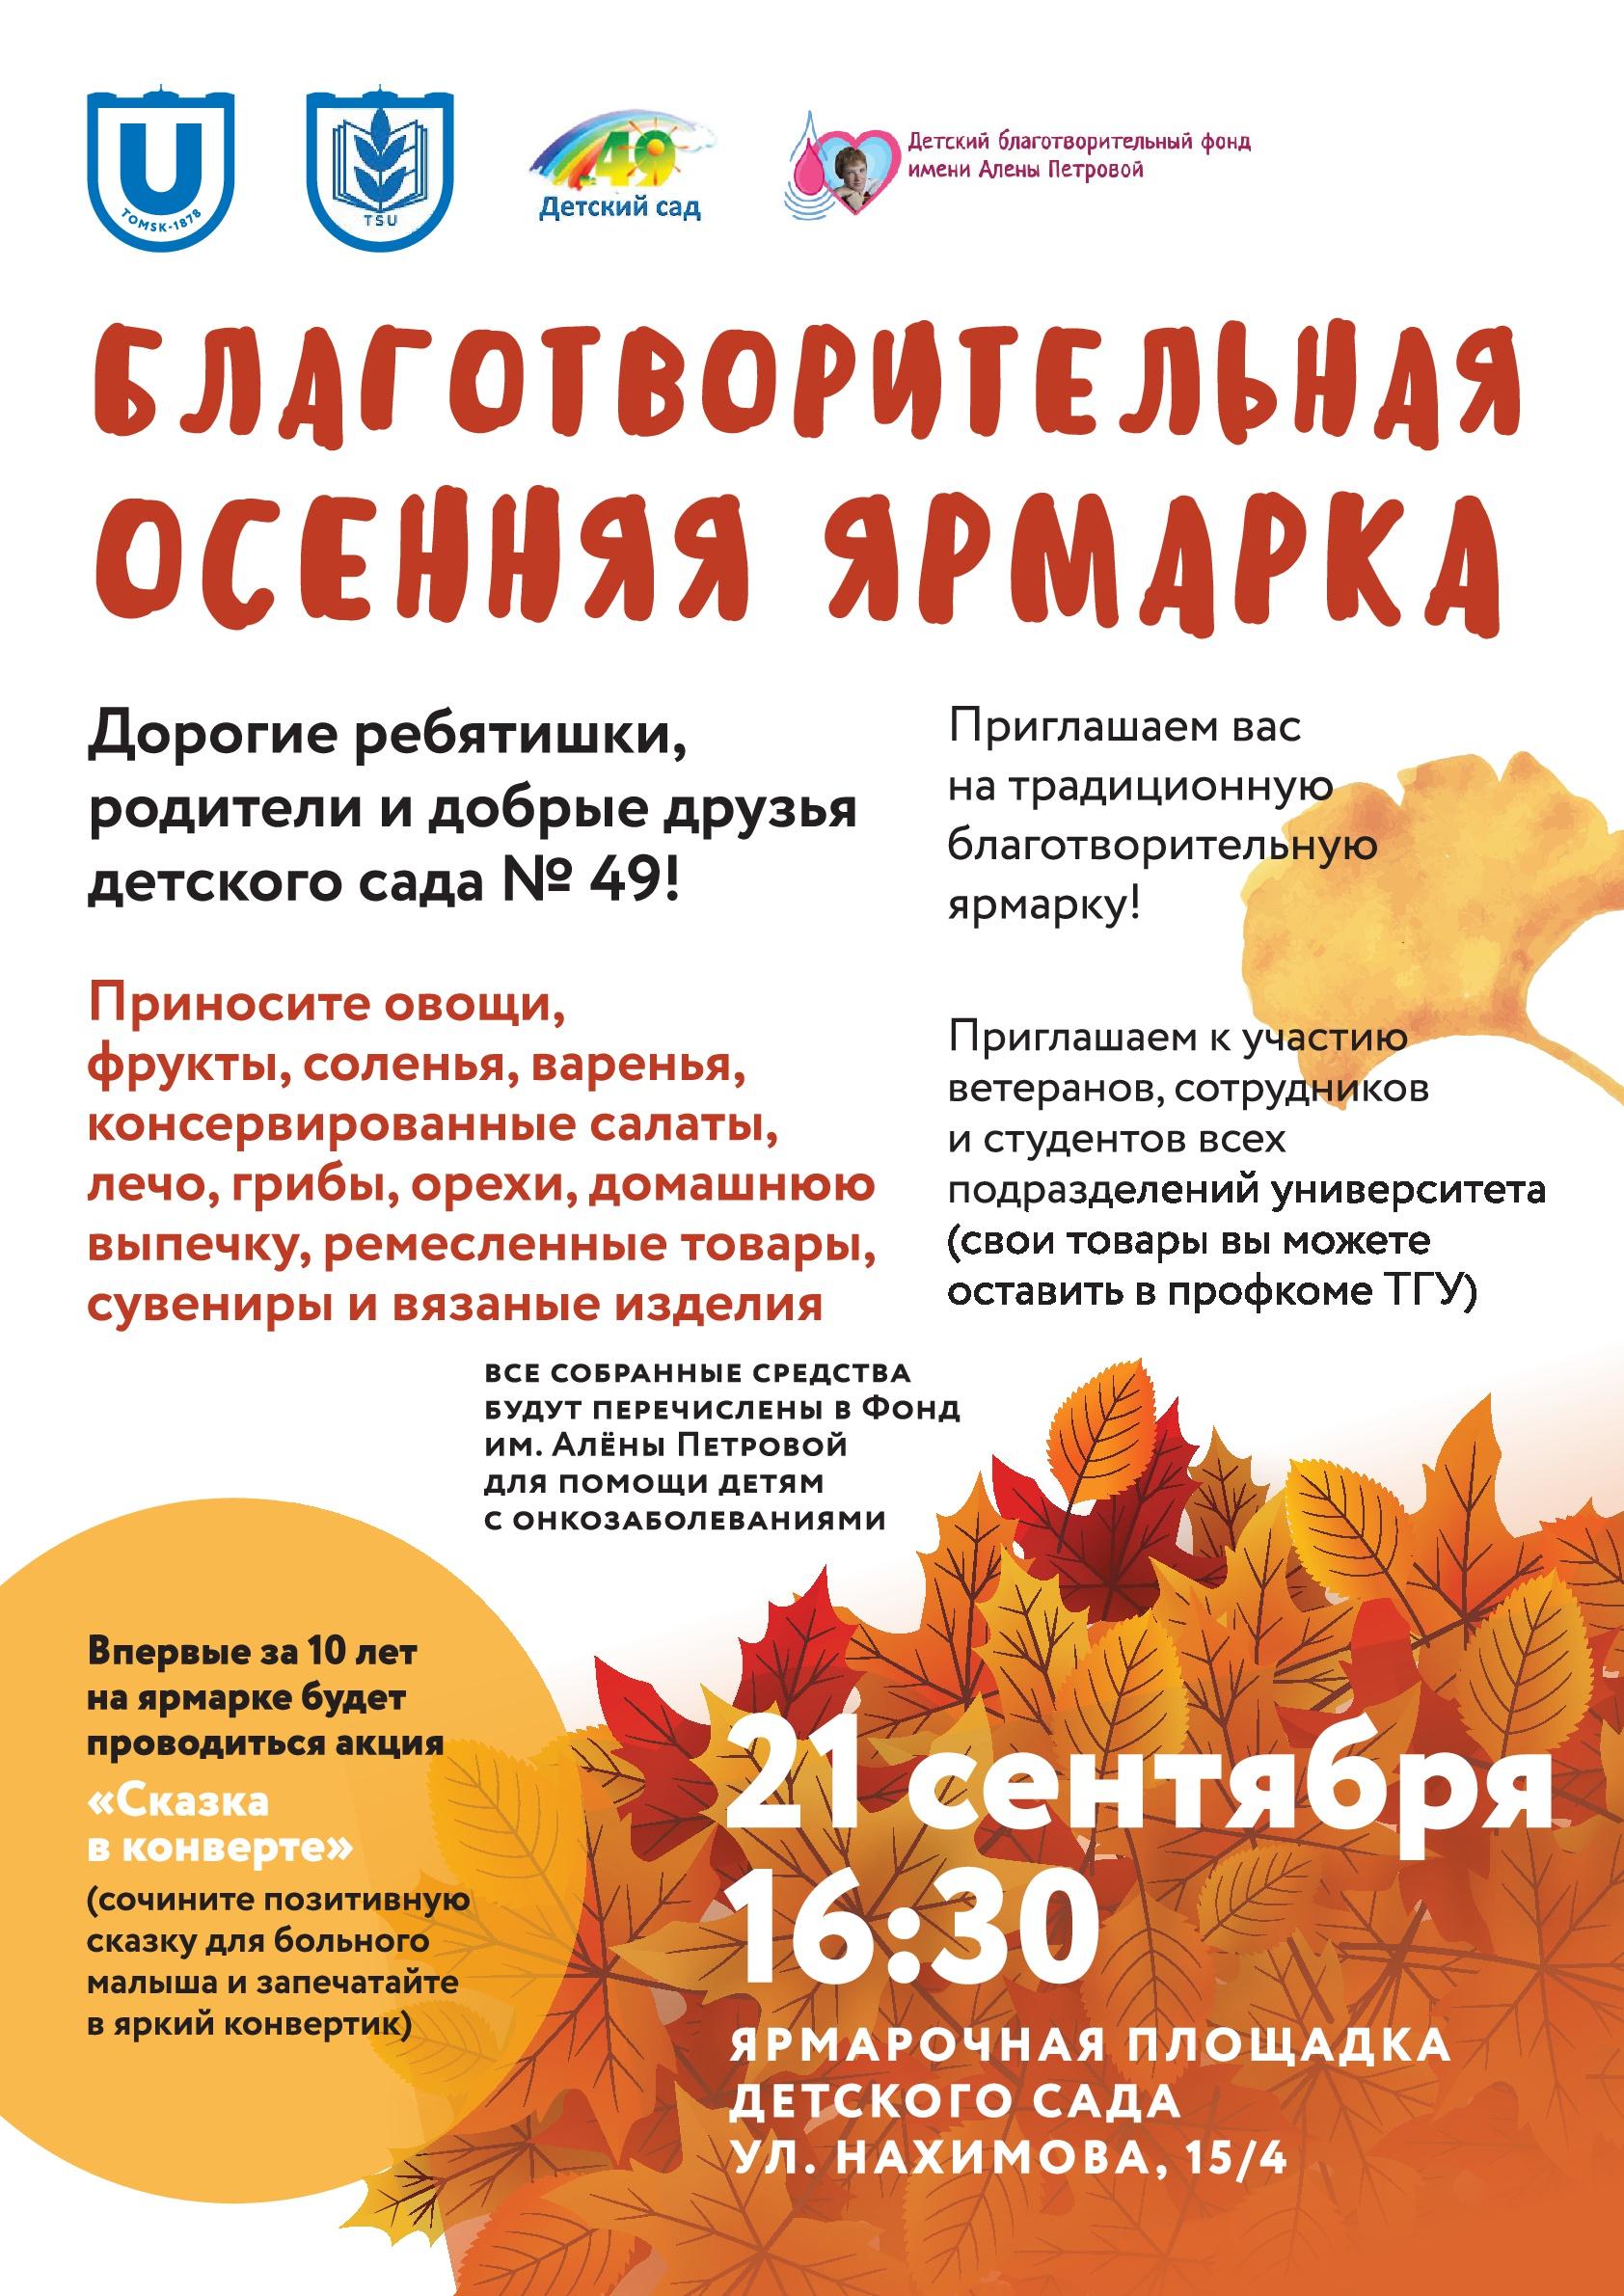 афиша ярмарка-001 (1)